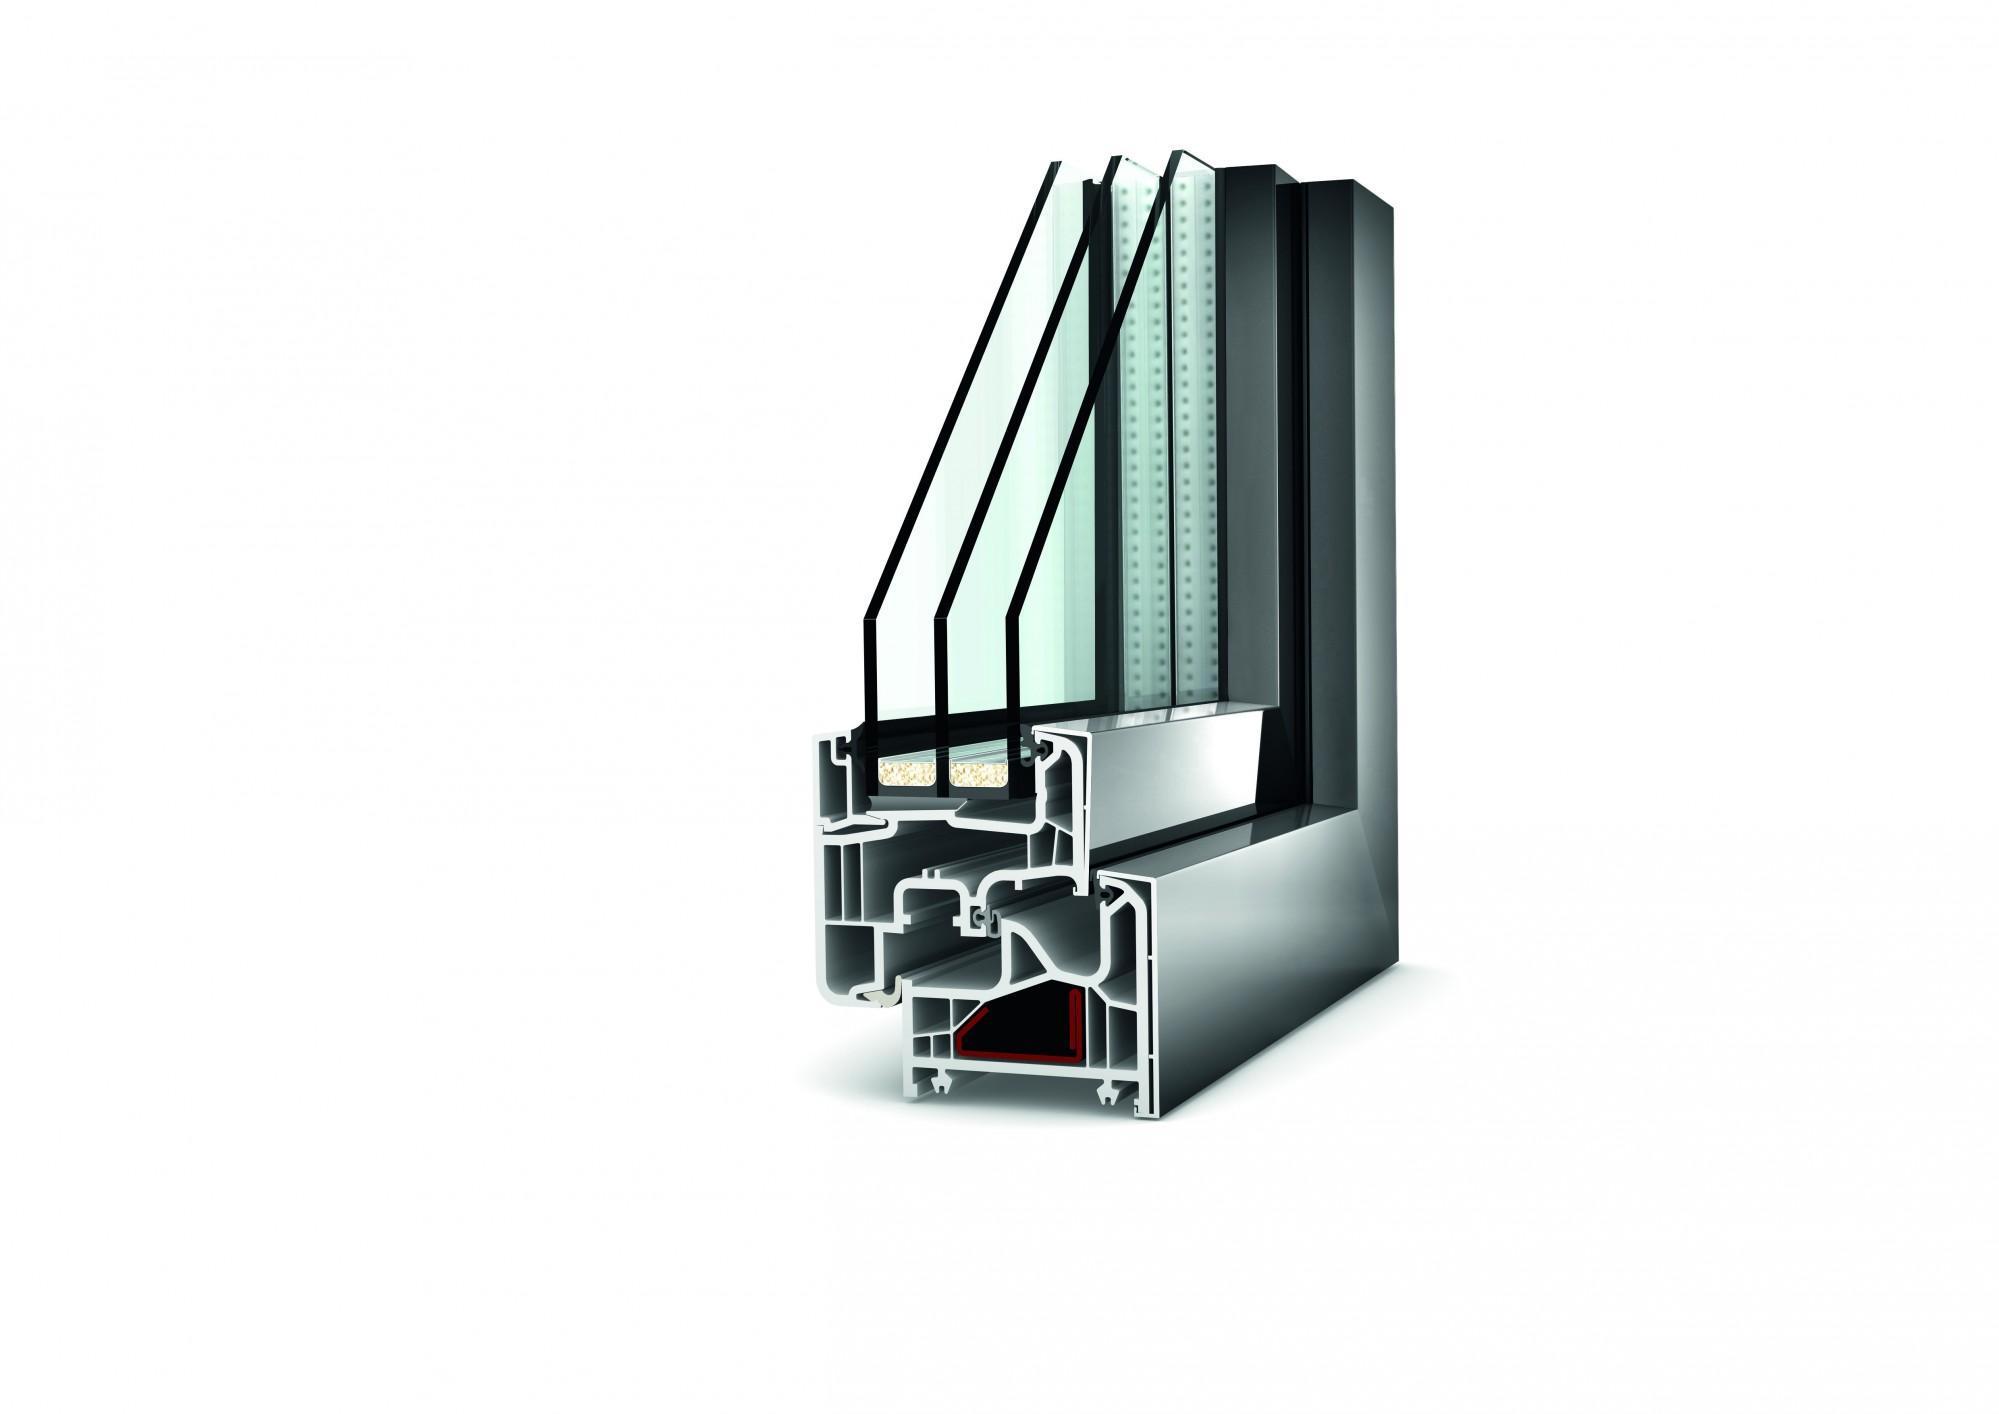 Fenêtre Mixte Pvcaluminium Gamme Premium Afp 13